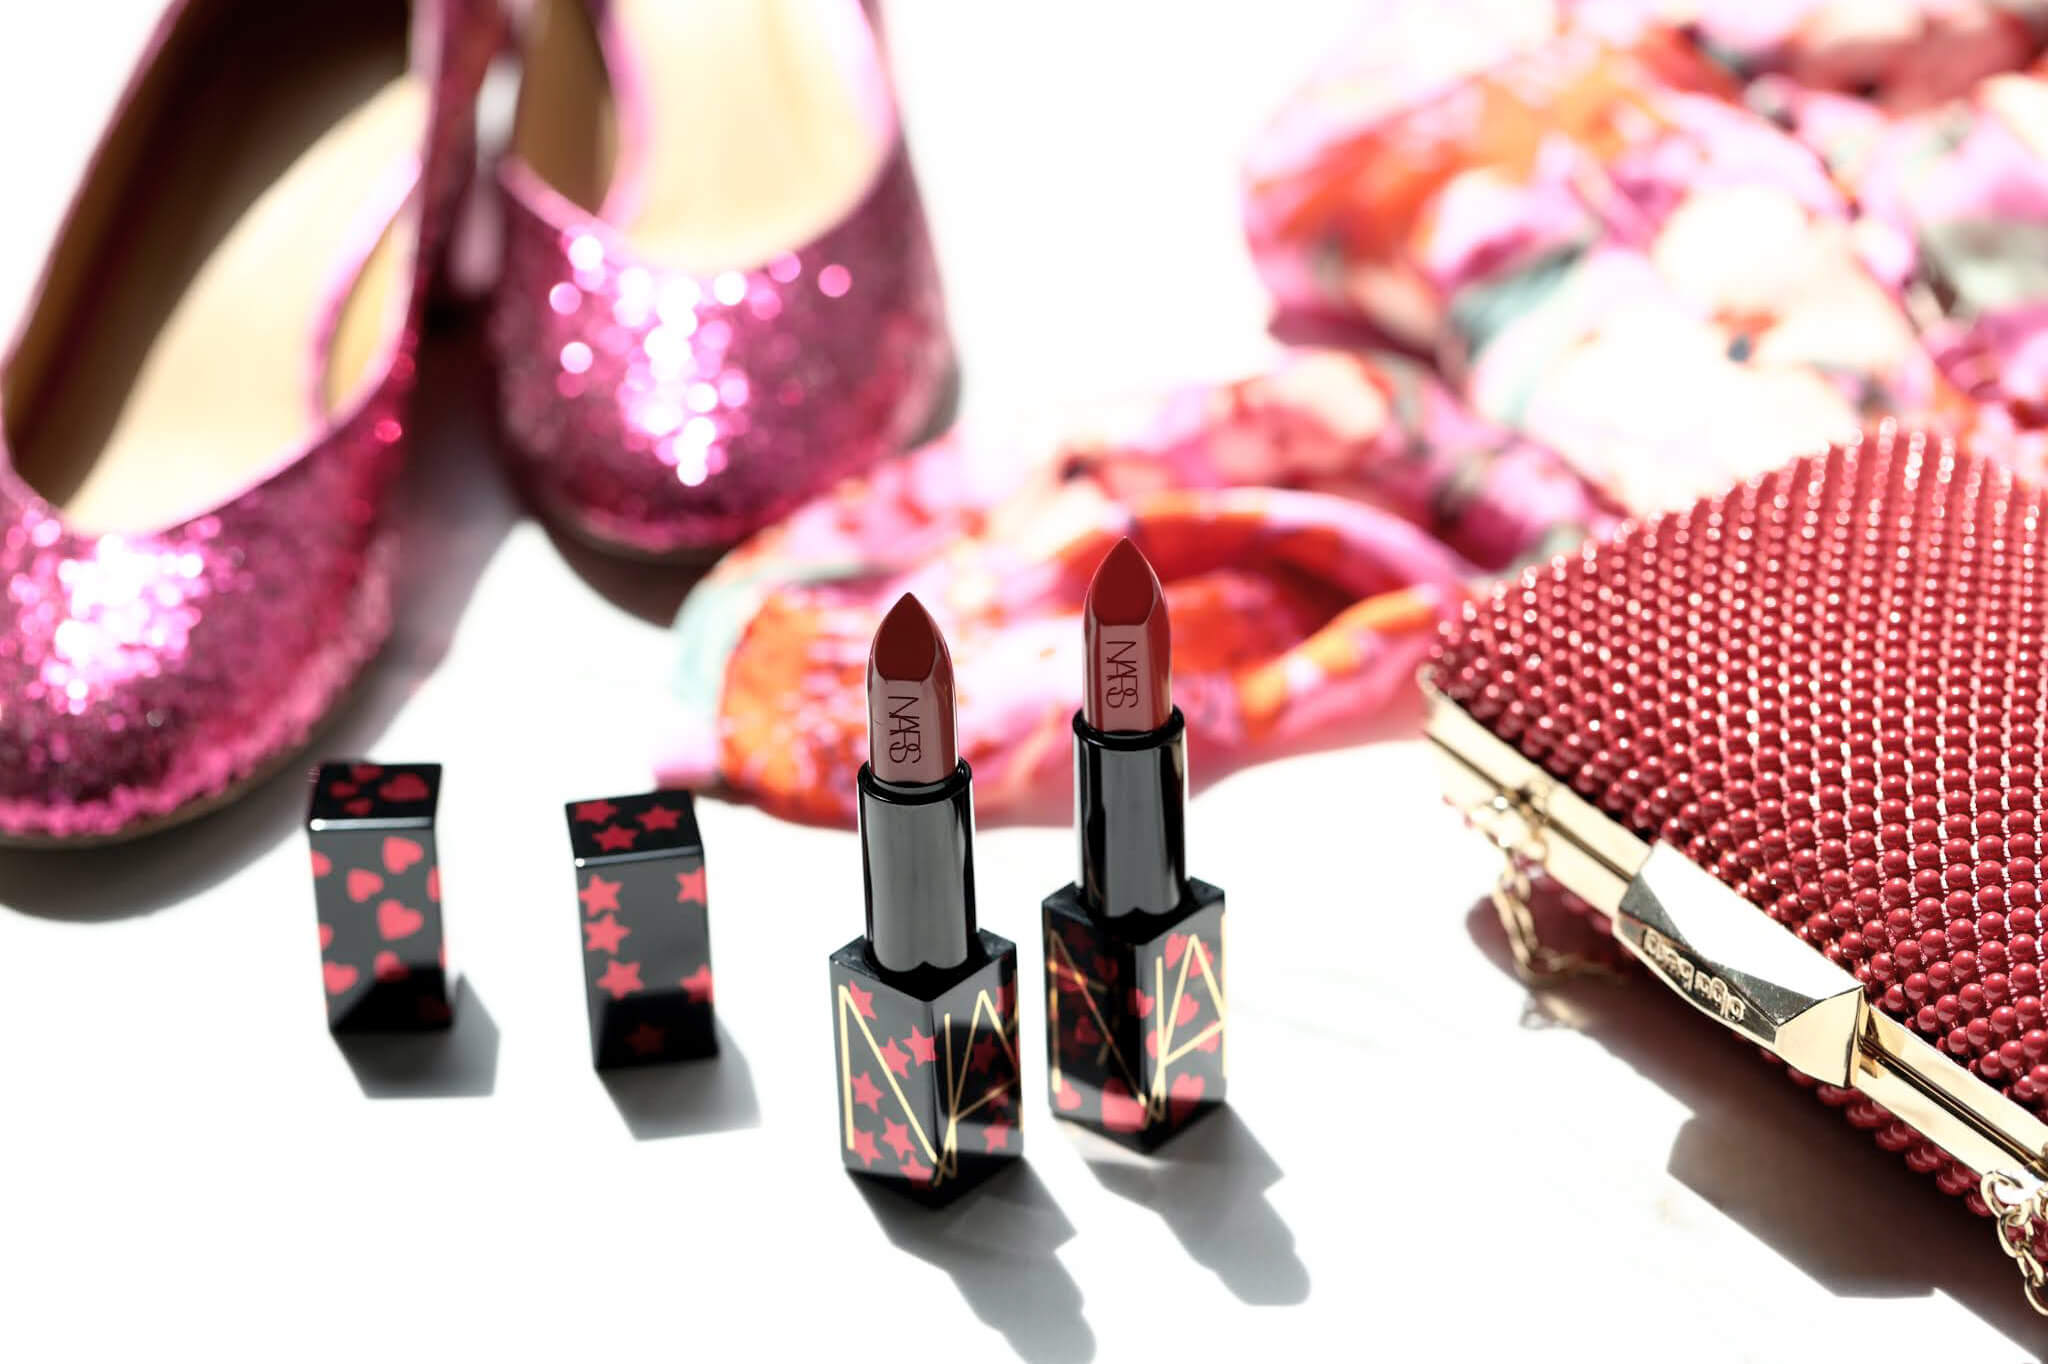 Nars Audacious Lipstick Lea Claudette